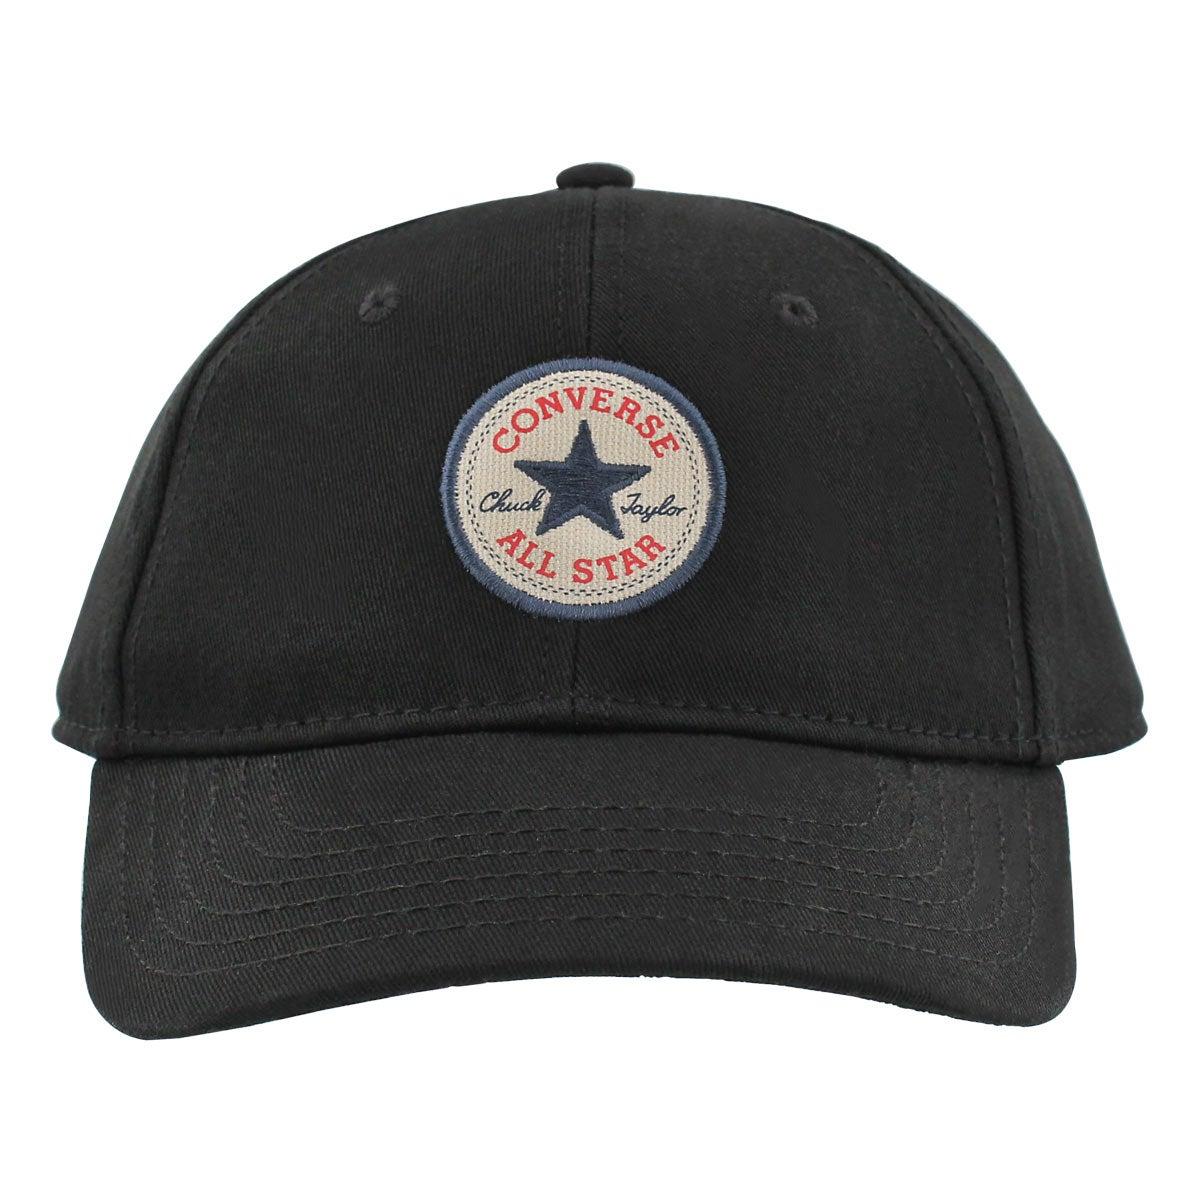 Women's CORE black adjustable precurve cap